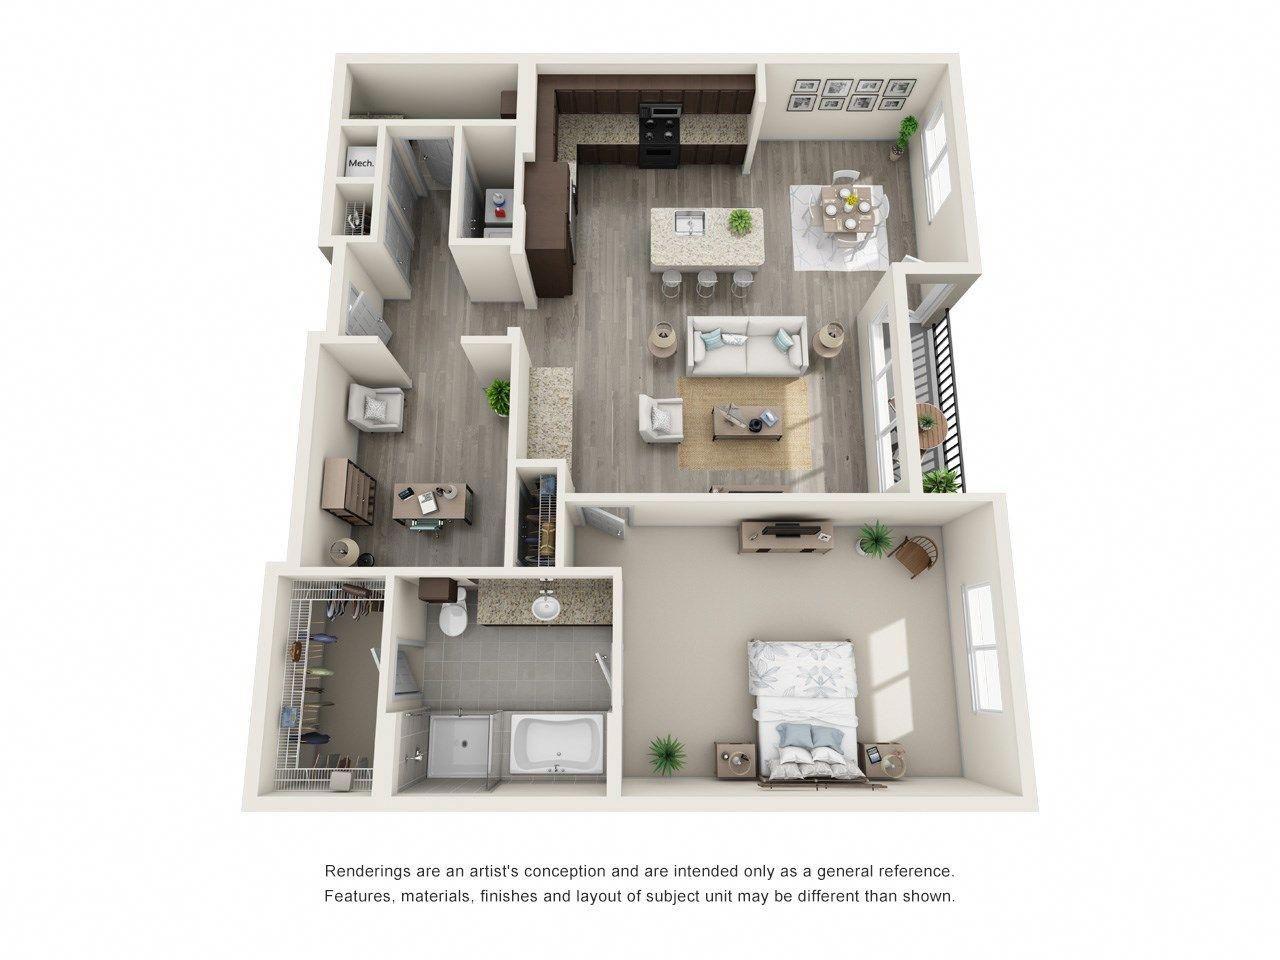 1 Bedroom W Studio 1129 Sf Homedecor101plus1 Sims House Plans House Plans Sims House